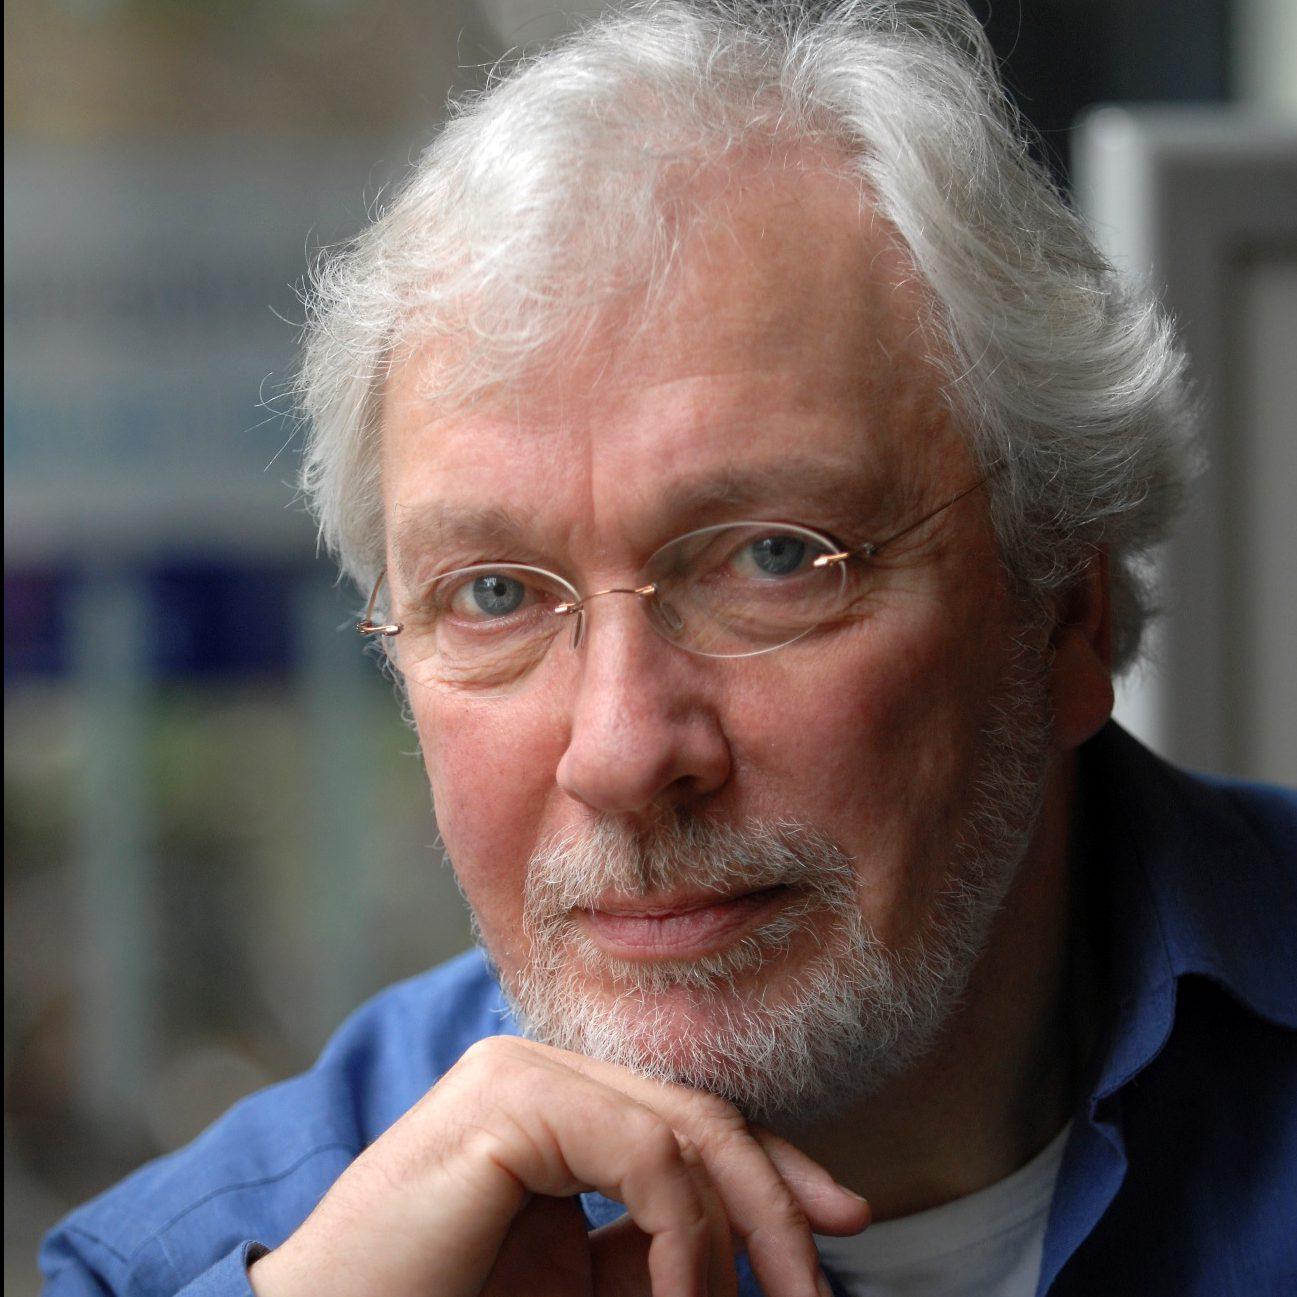 Jacques van Rossum